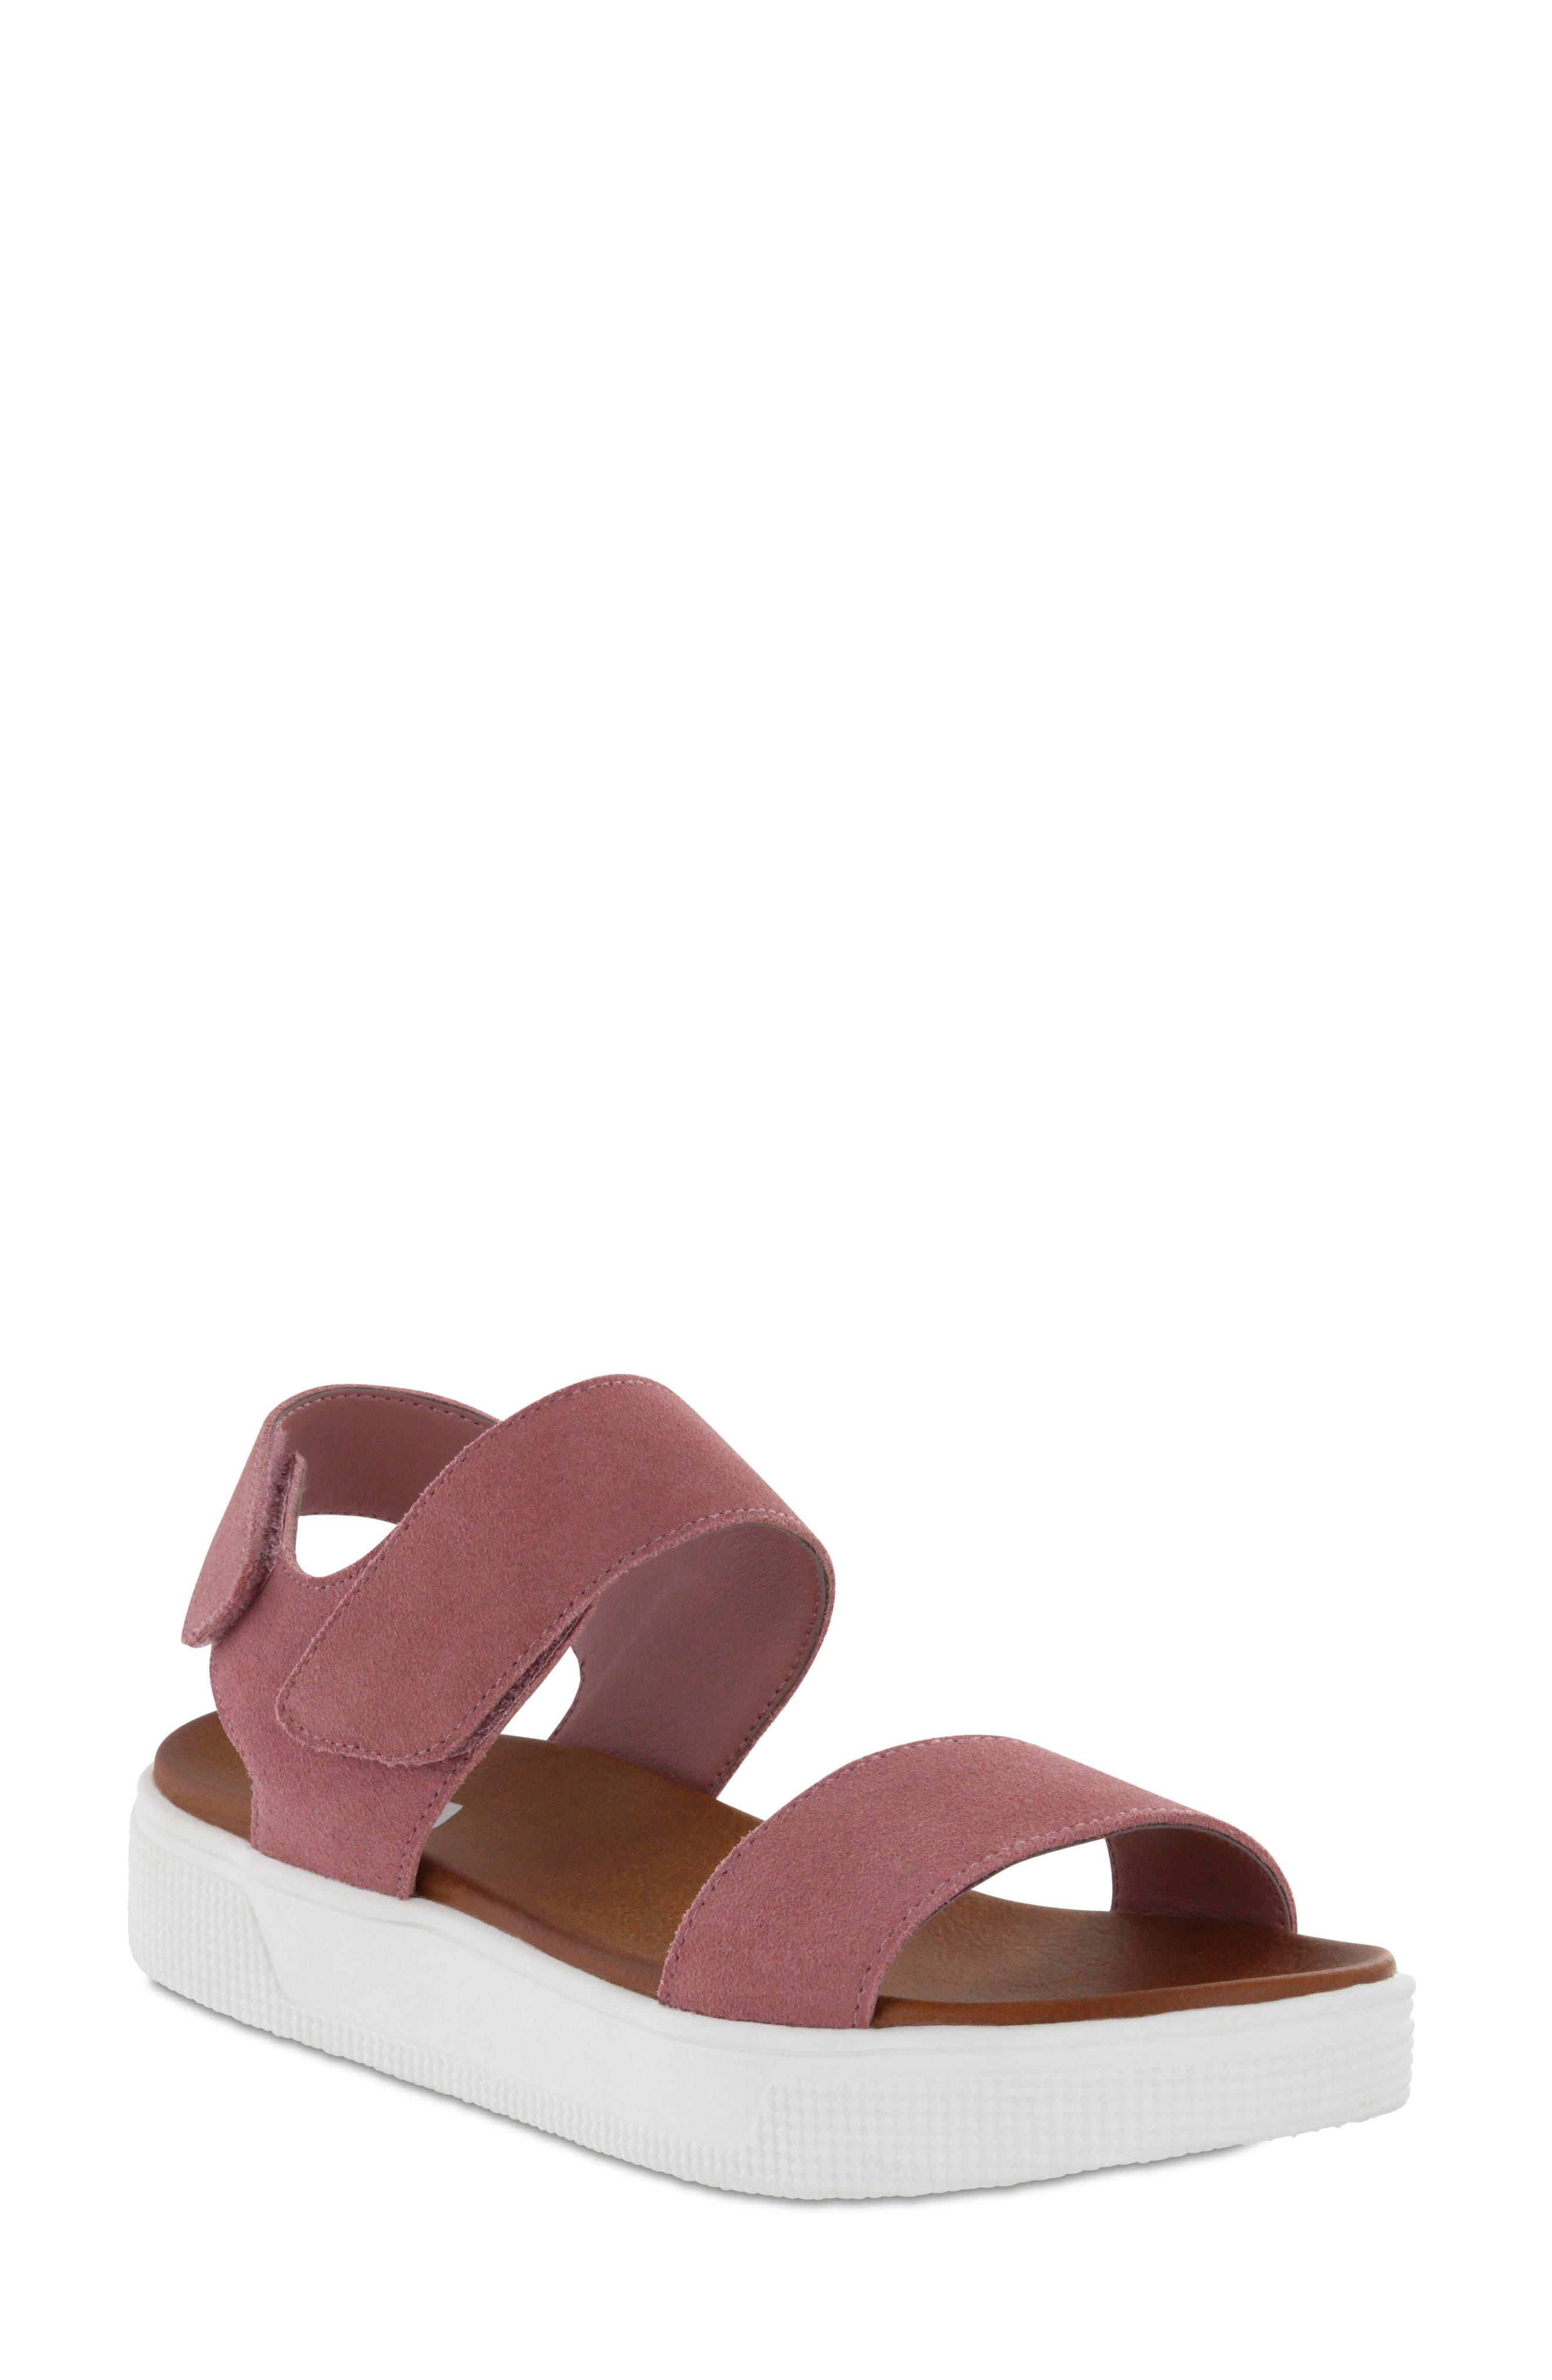 Troy Slingback Platform Sandal,                         Main,                         color, Mauve Suede